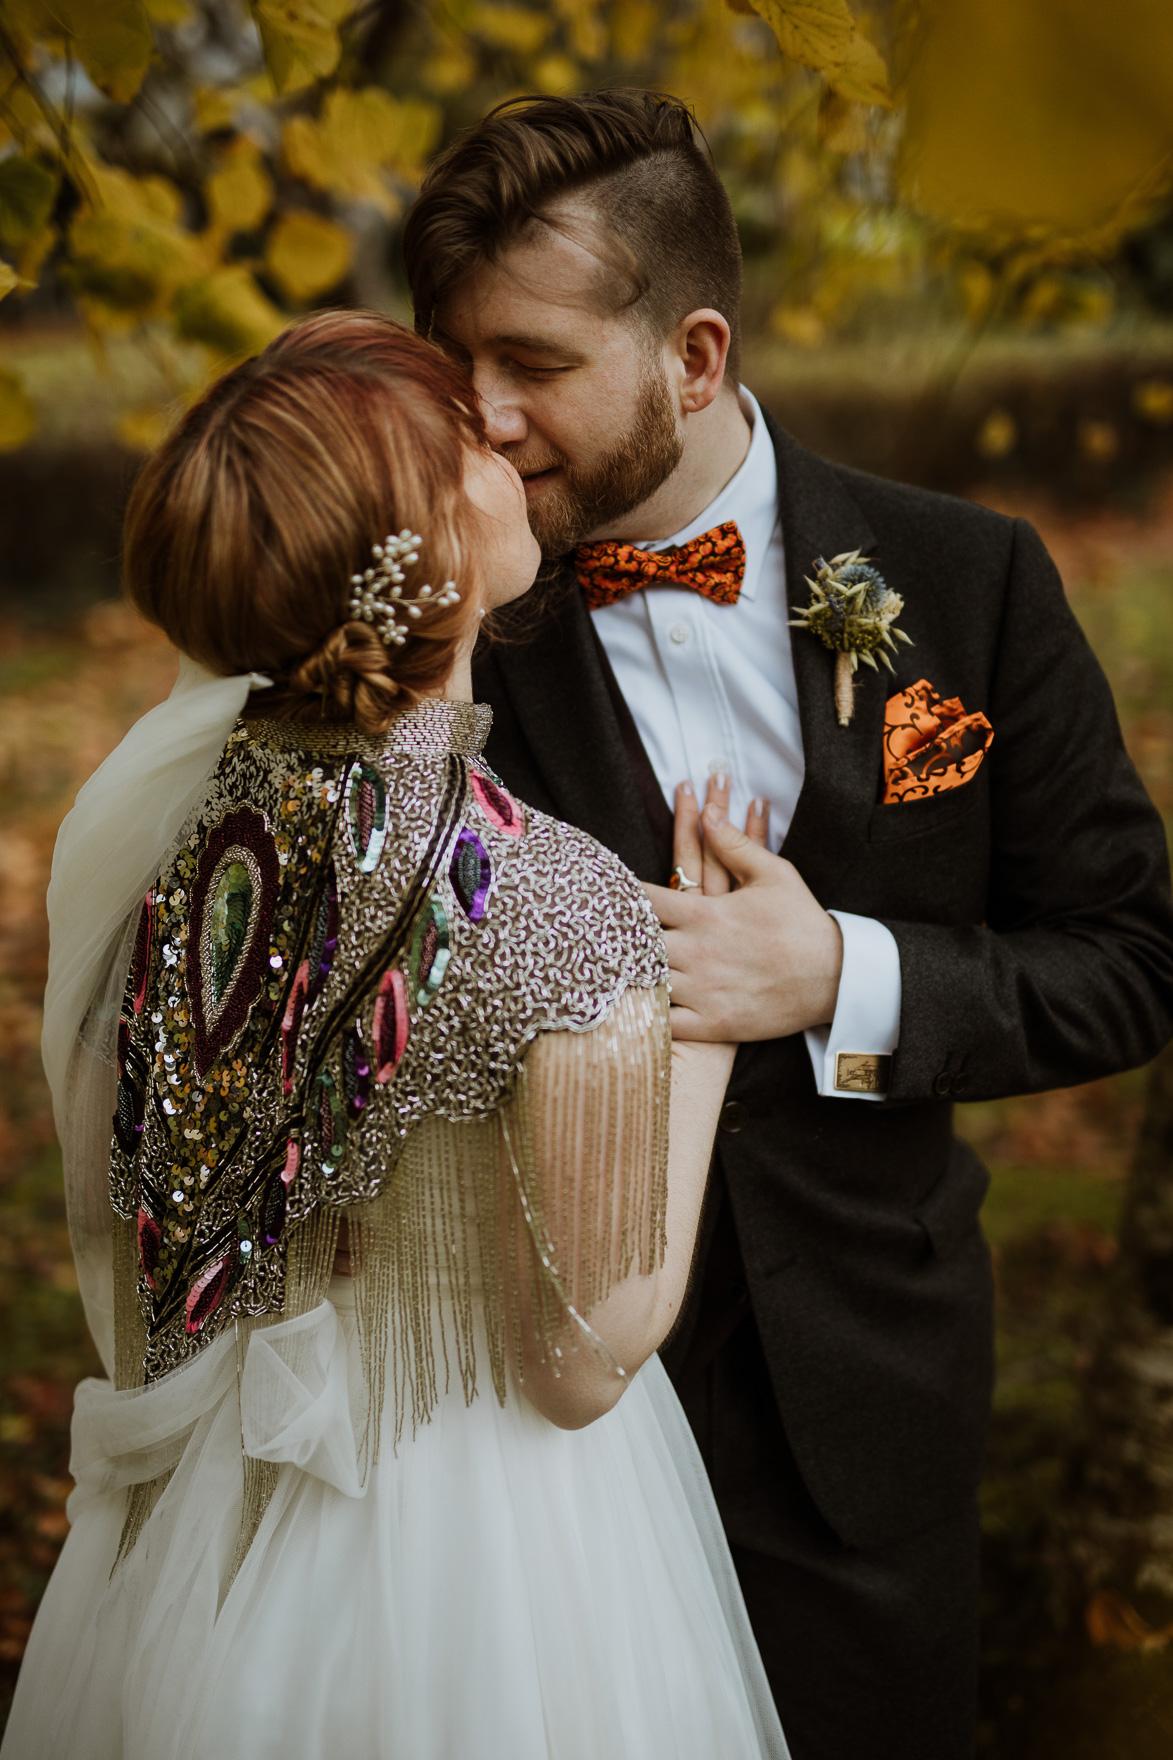 A person wearing a wedding dress